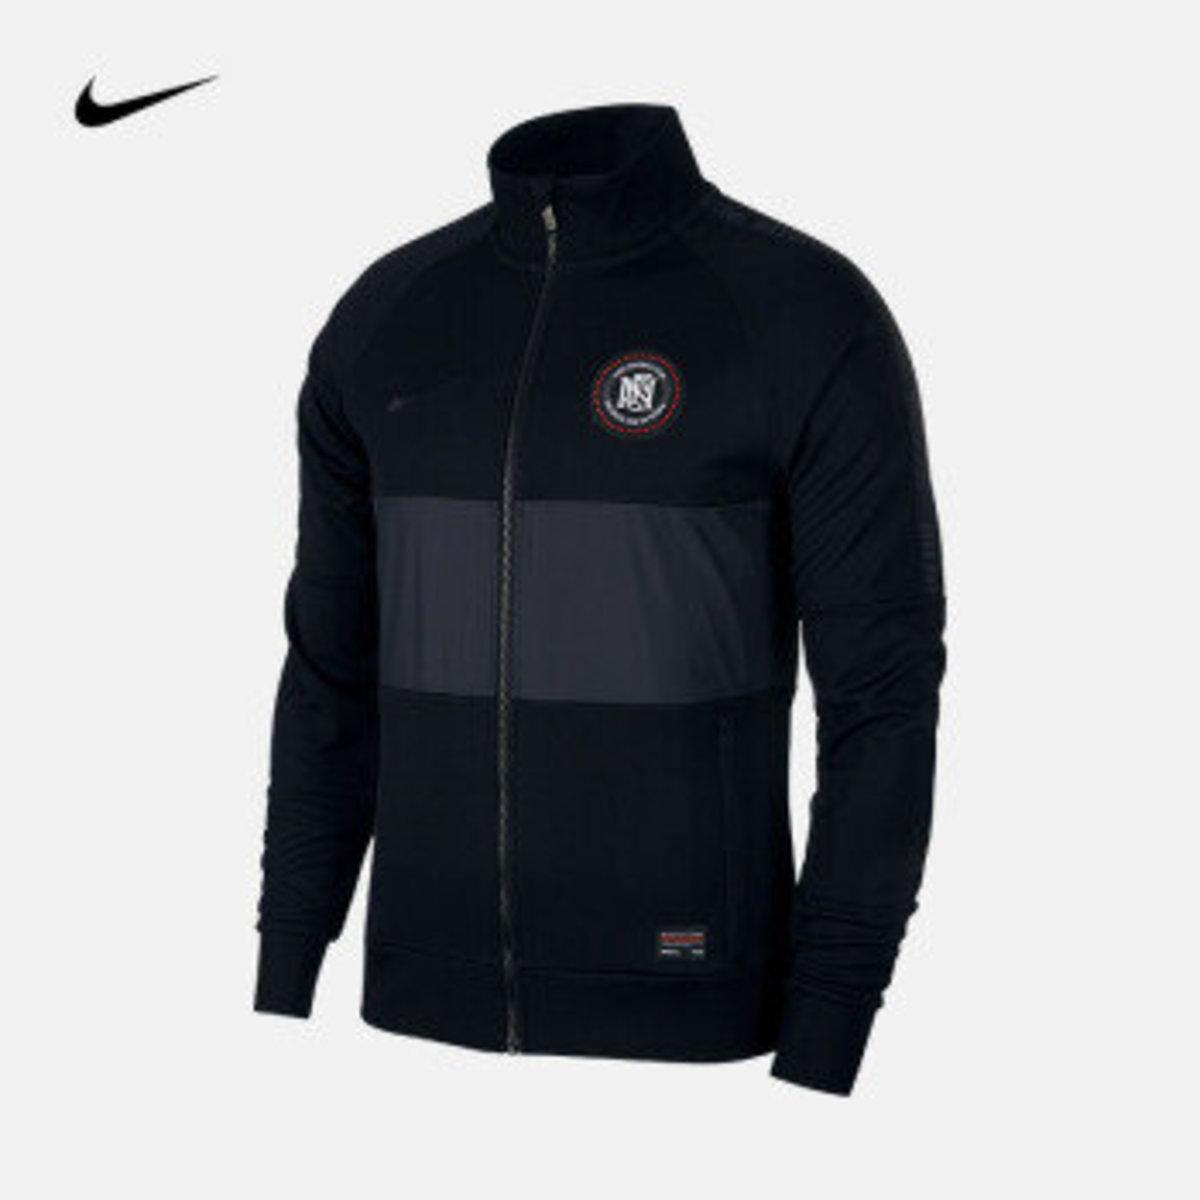 NIKE FC Track Jacket AH9520 -010